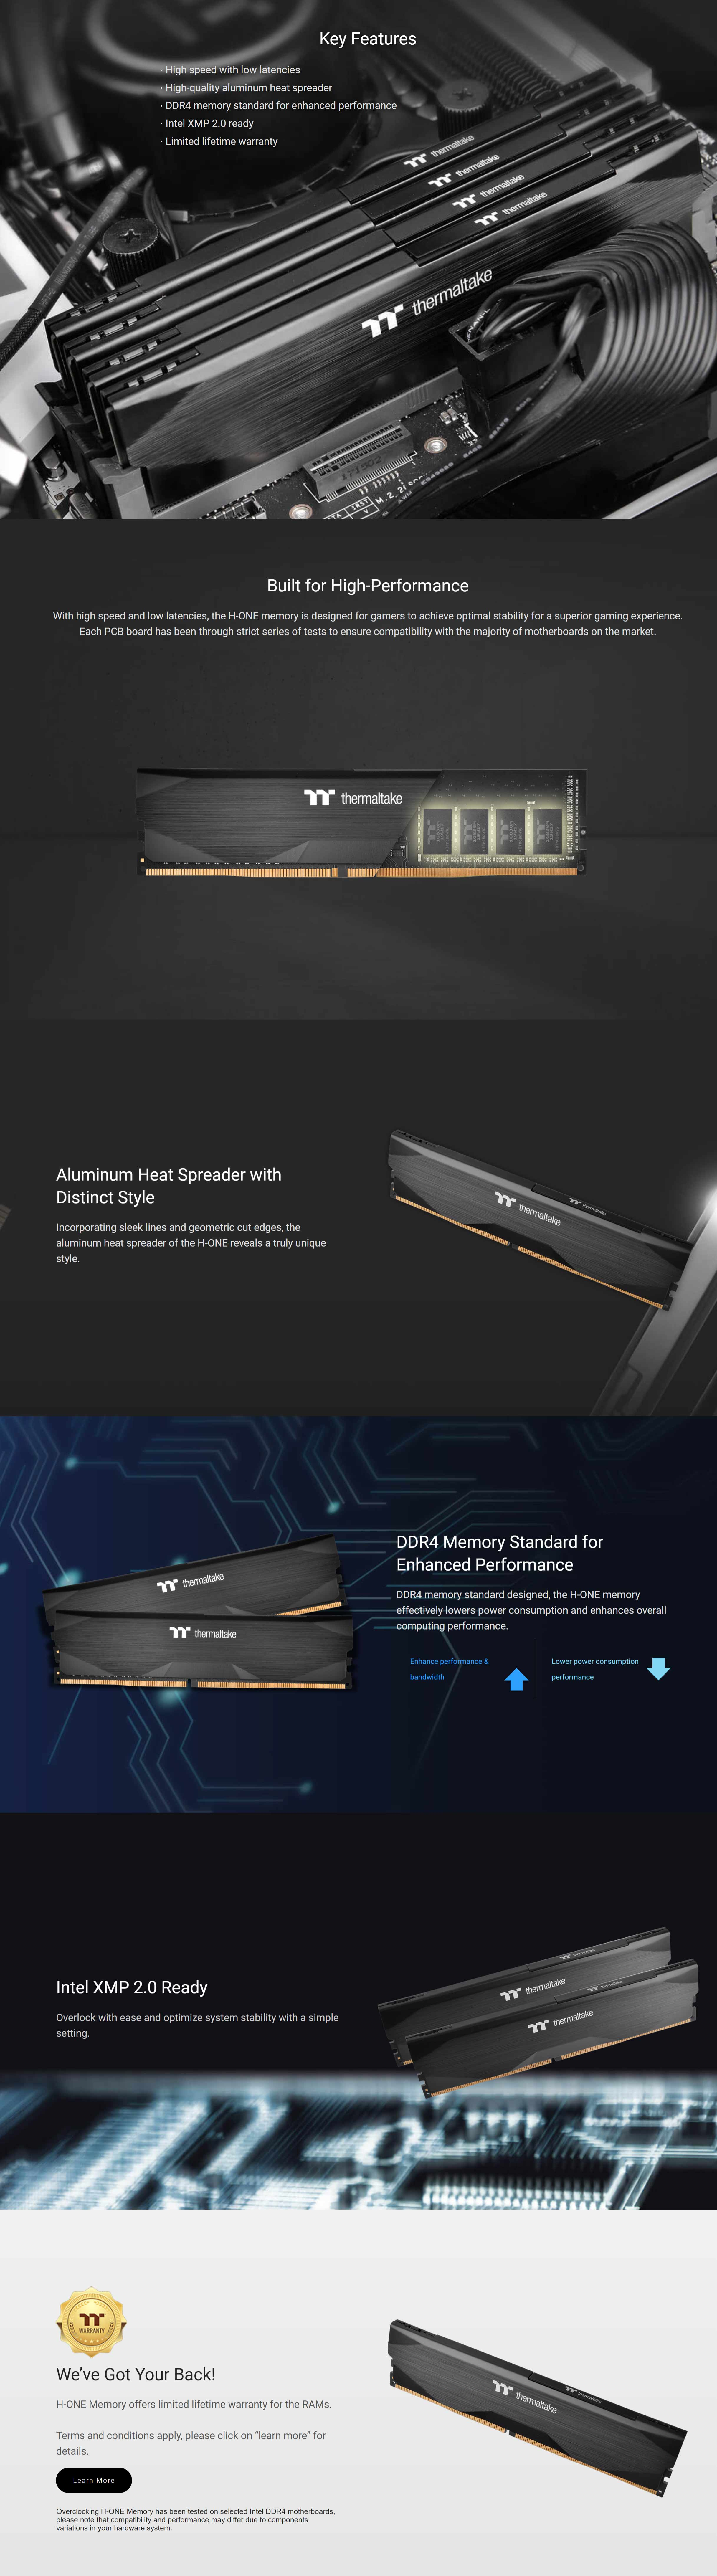 screencapture-thermaltake-au-h-one-gaming-memory-ddr4-3200mhz-8gbx2-html-2020-04-25-11_38_12.jpg